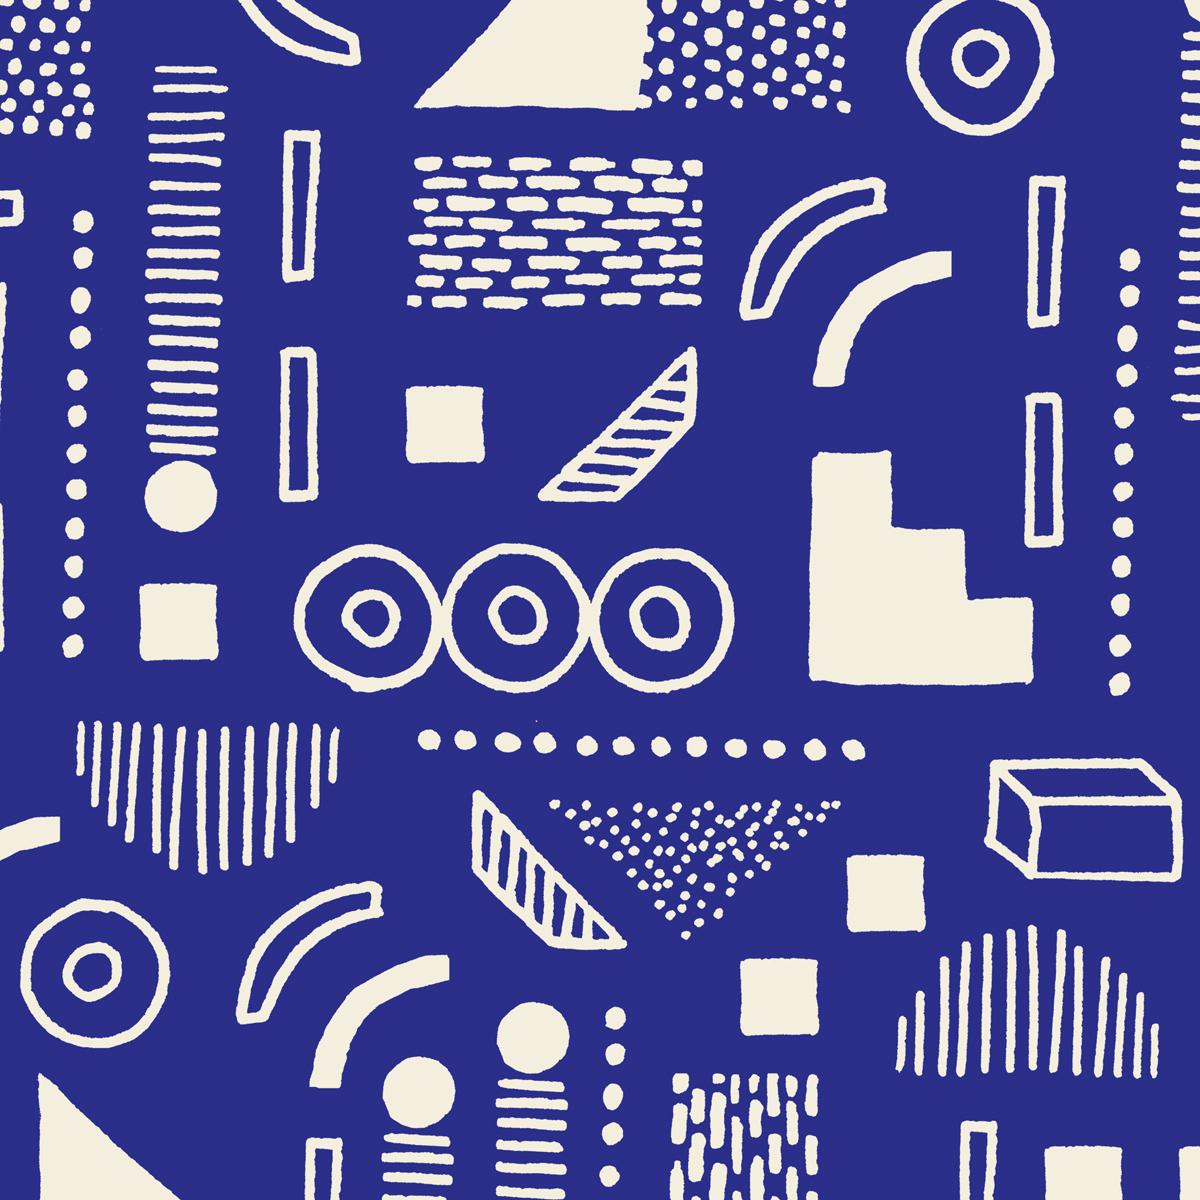 Annalisa Papagna shop - Sophie #1 notebook pattern